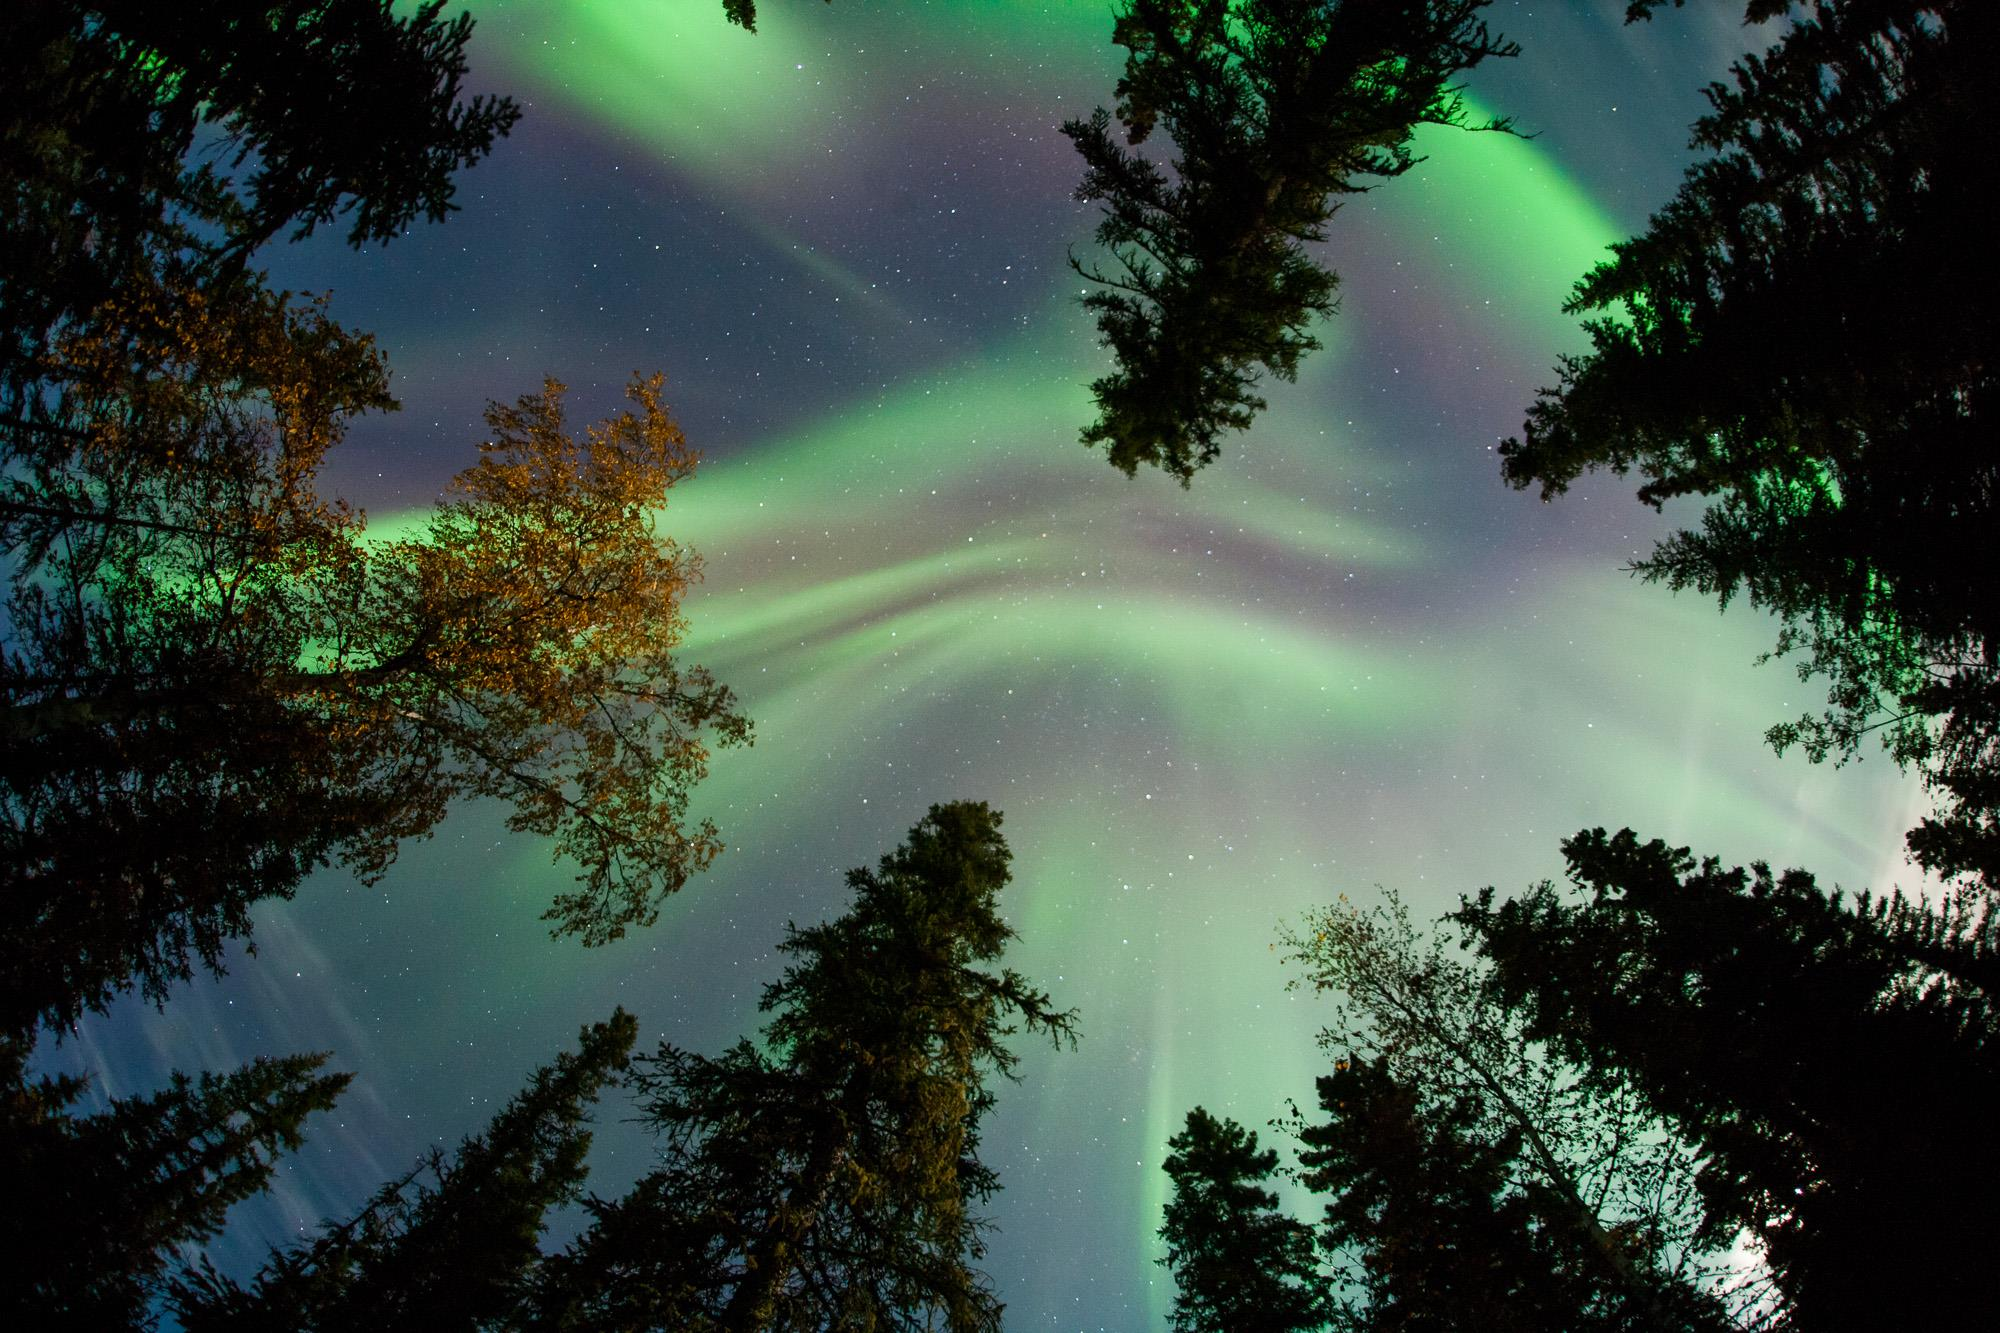 Solar Storms Ignite Awesome Auroras - NBC News